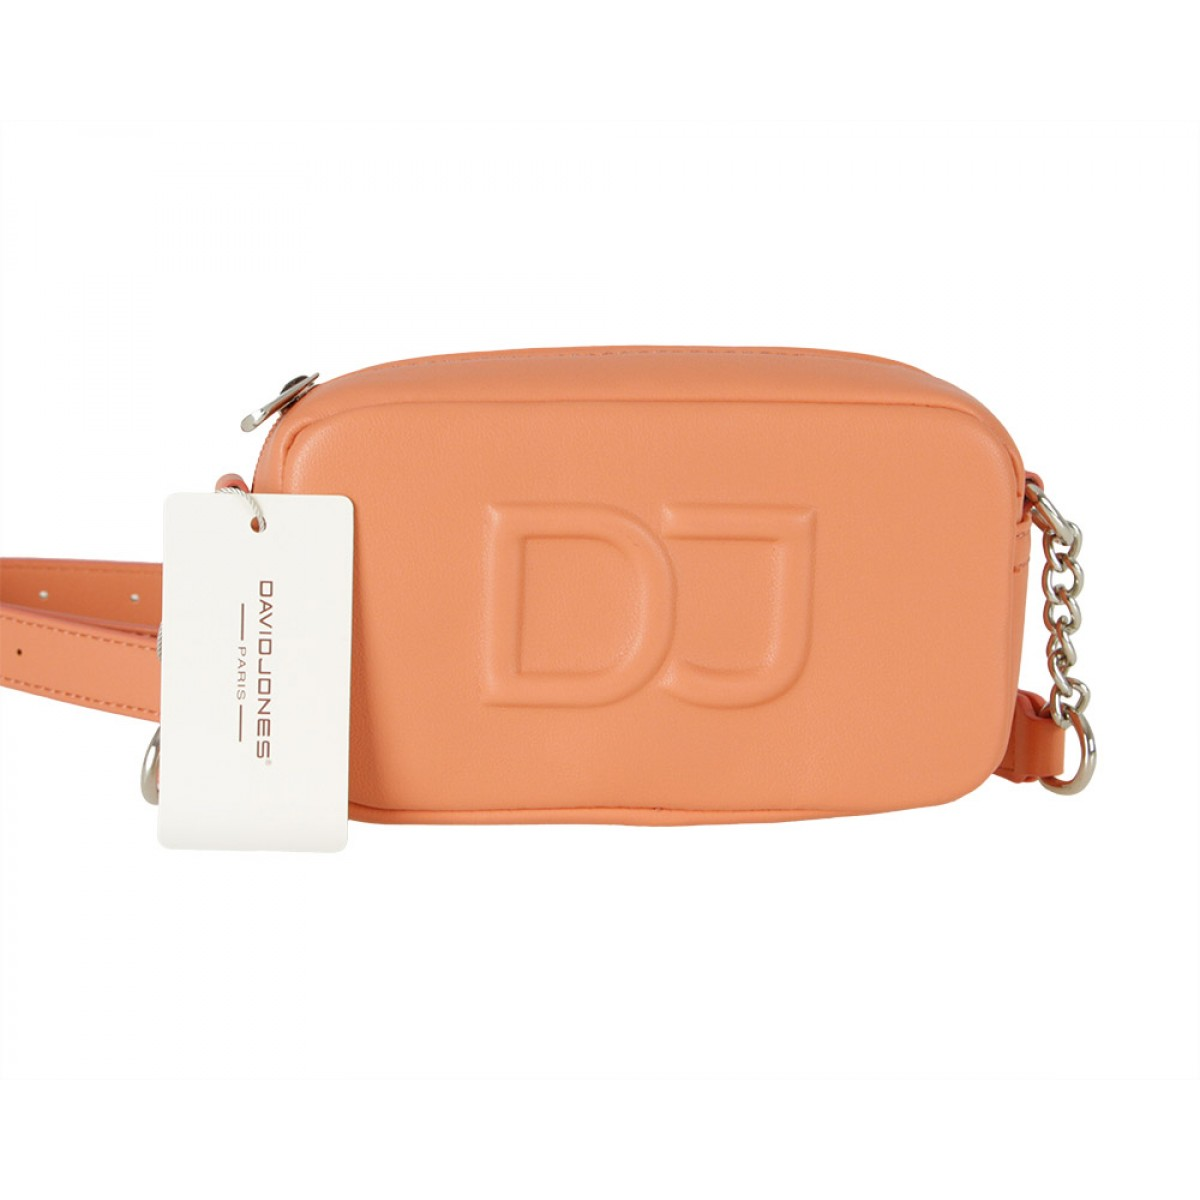 Жіноча сумка David Jones 6260-1 CORAL